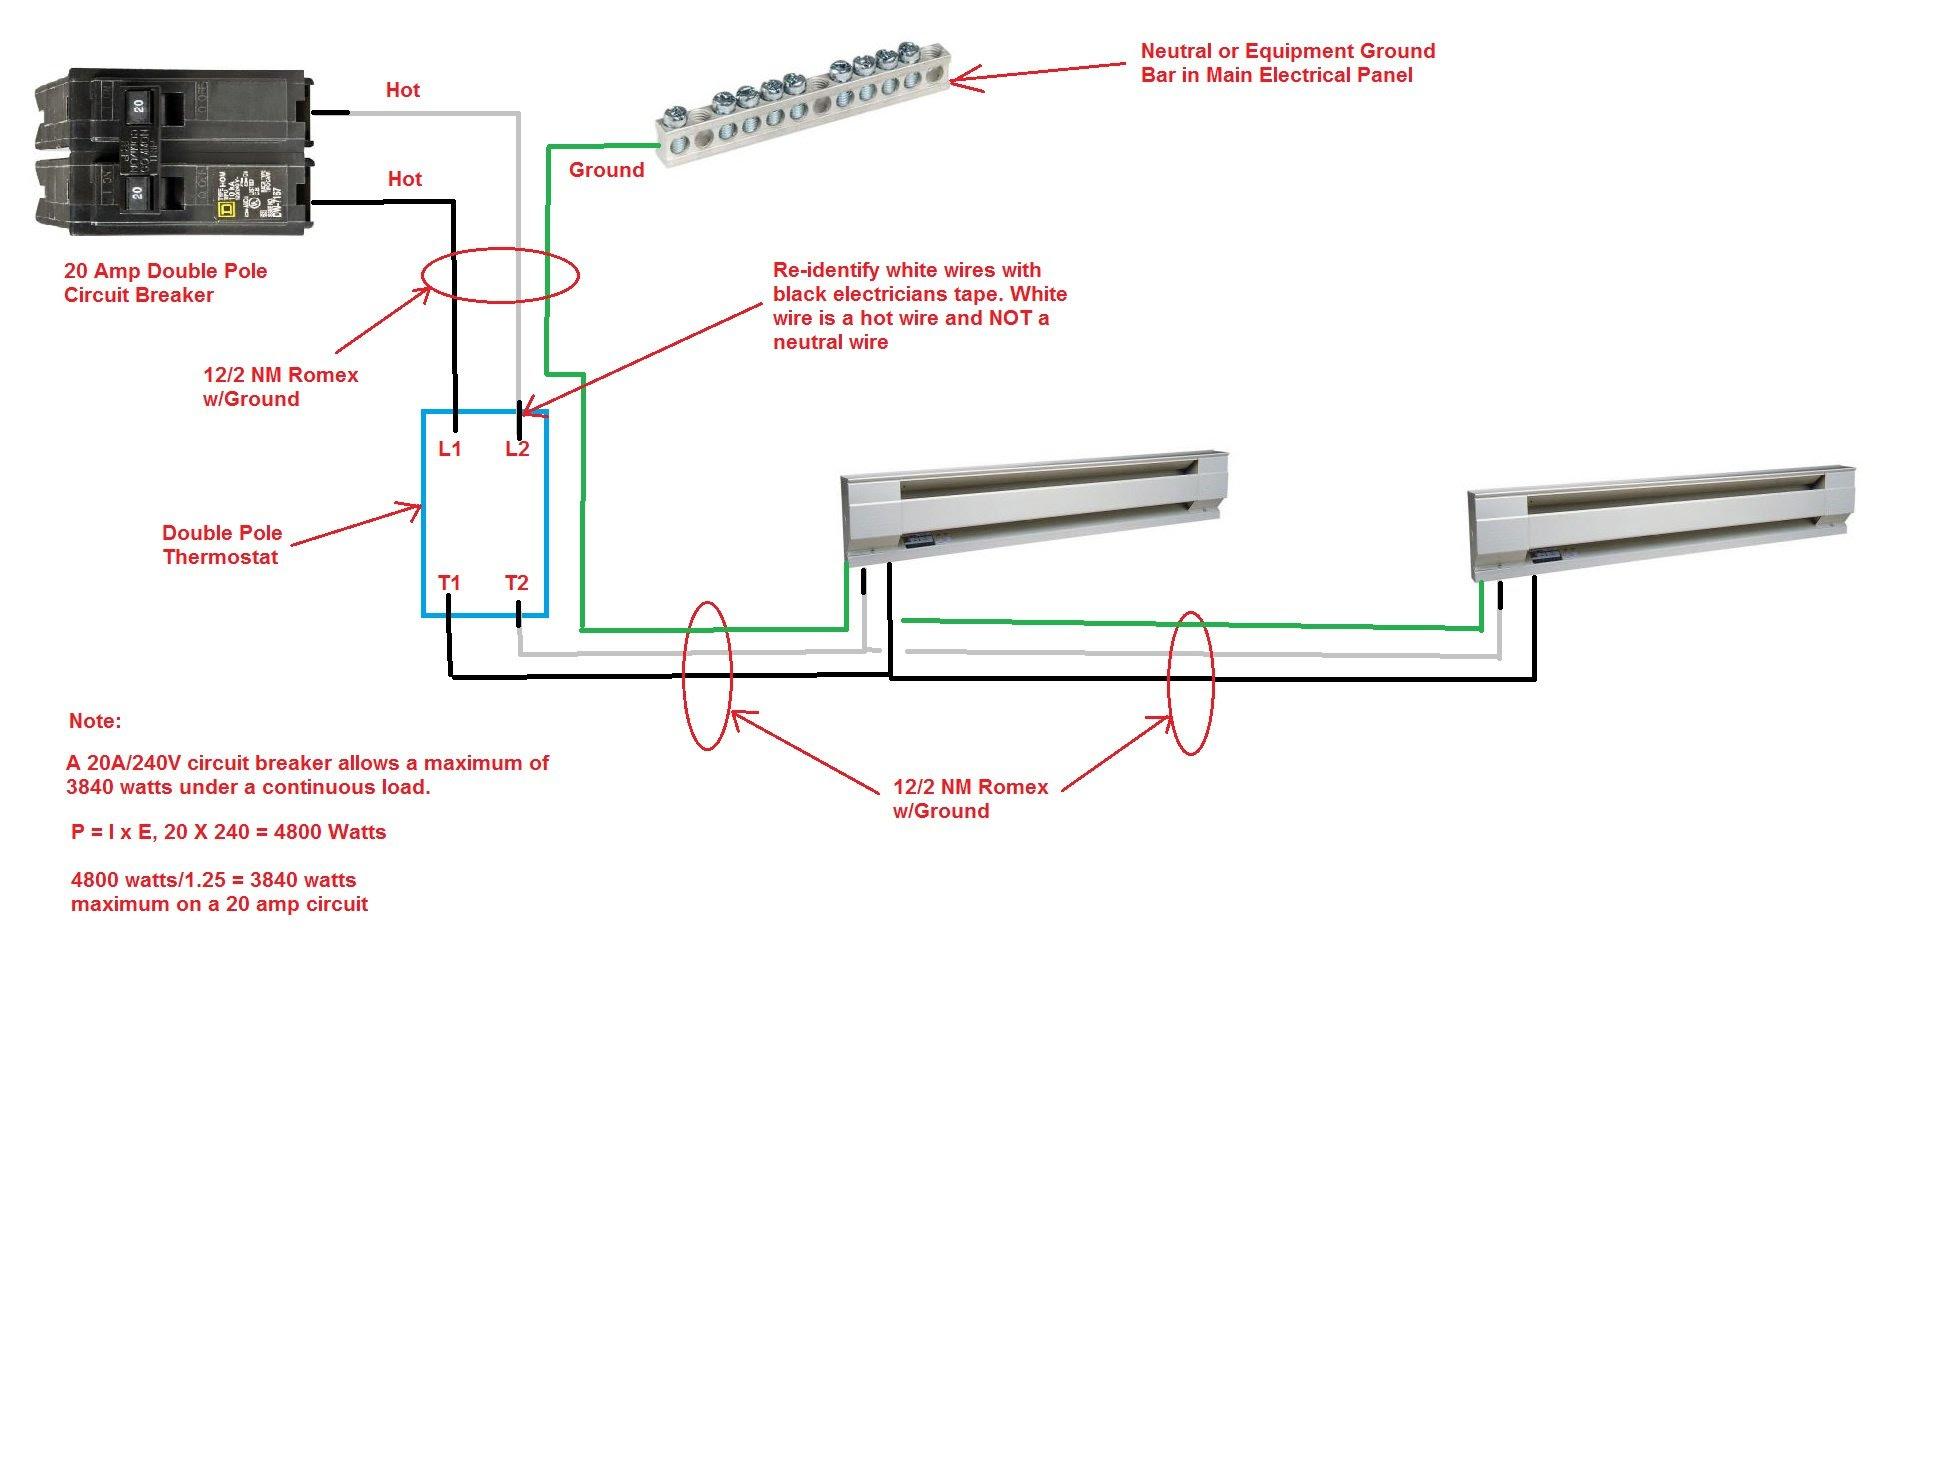 Diagram 120 Volt Baseboard Heater Thermostat Wiring Diagram Full Version Hd Quality Wiring Diagram Anklediagram1i Hoteldomusaurea It